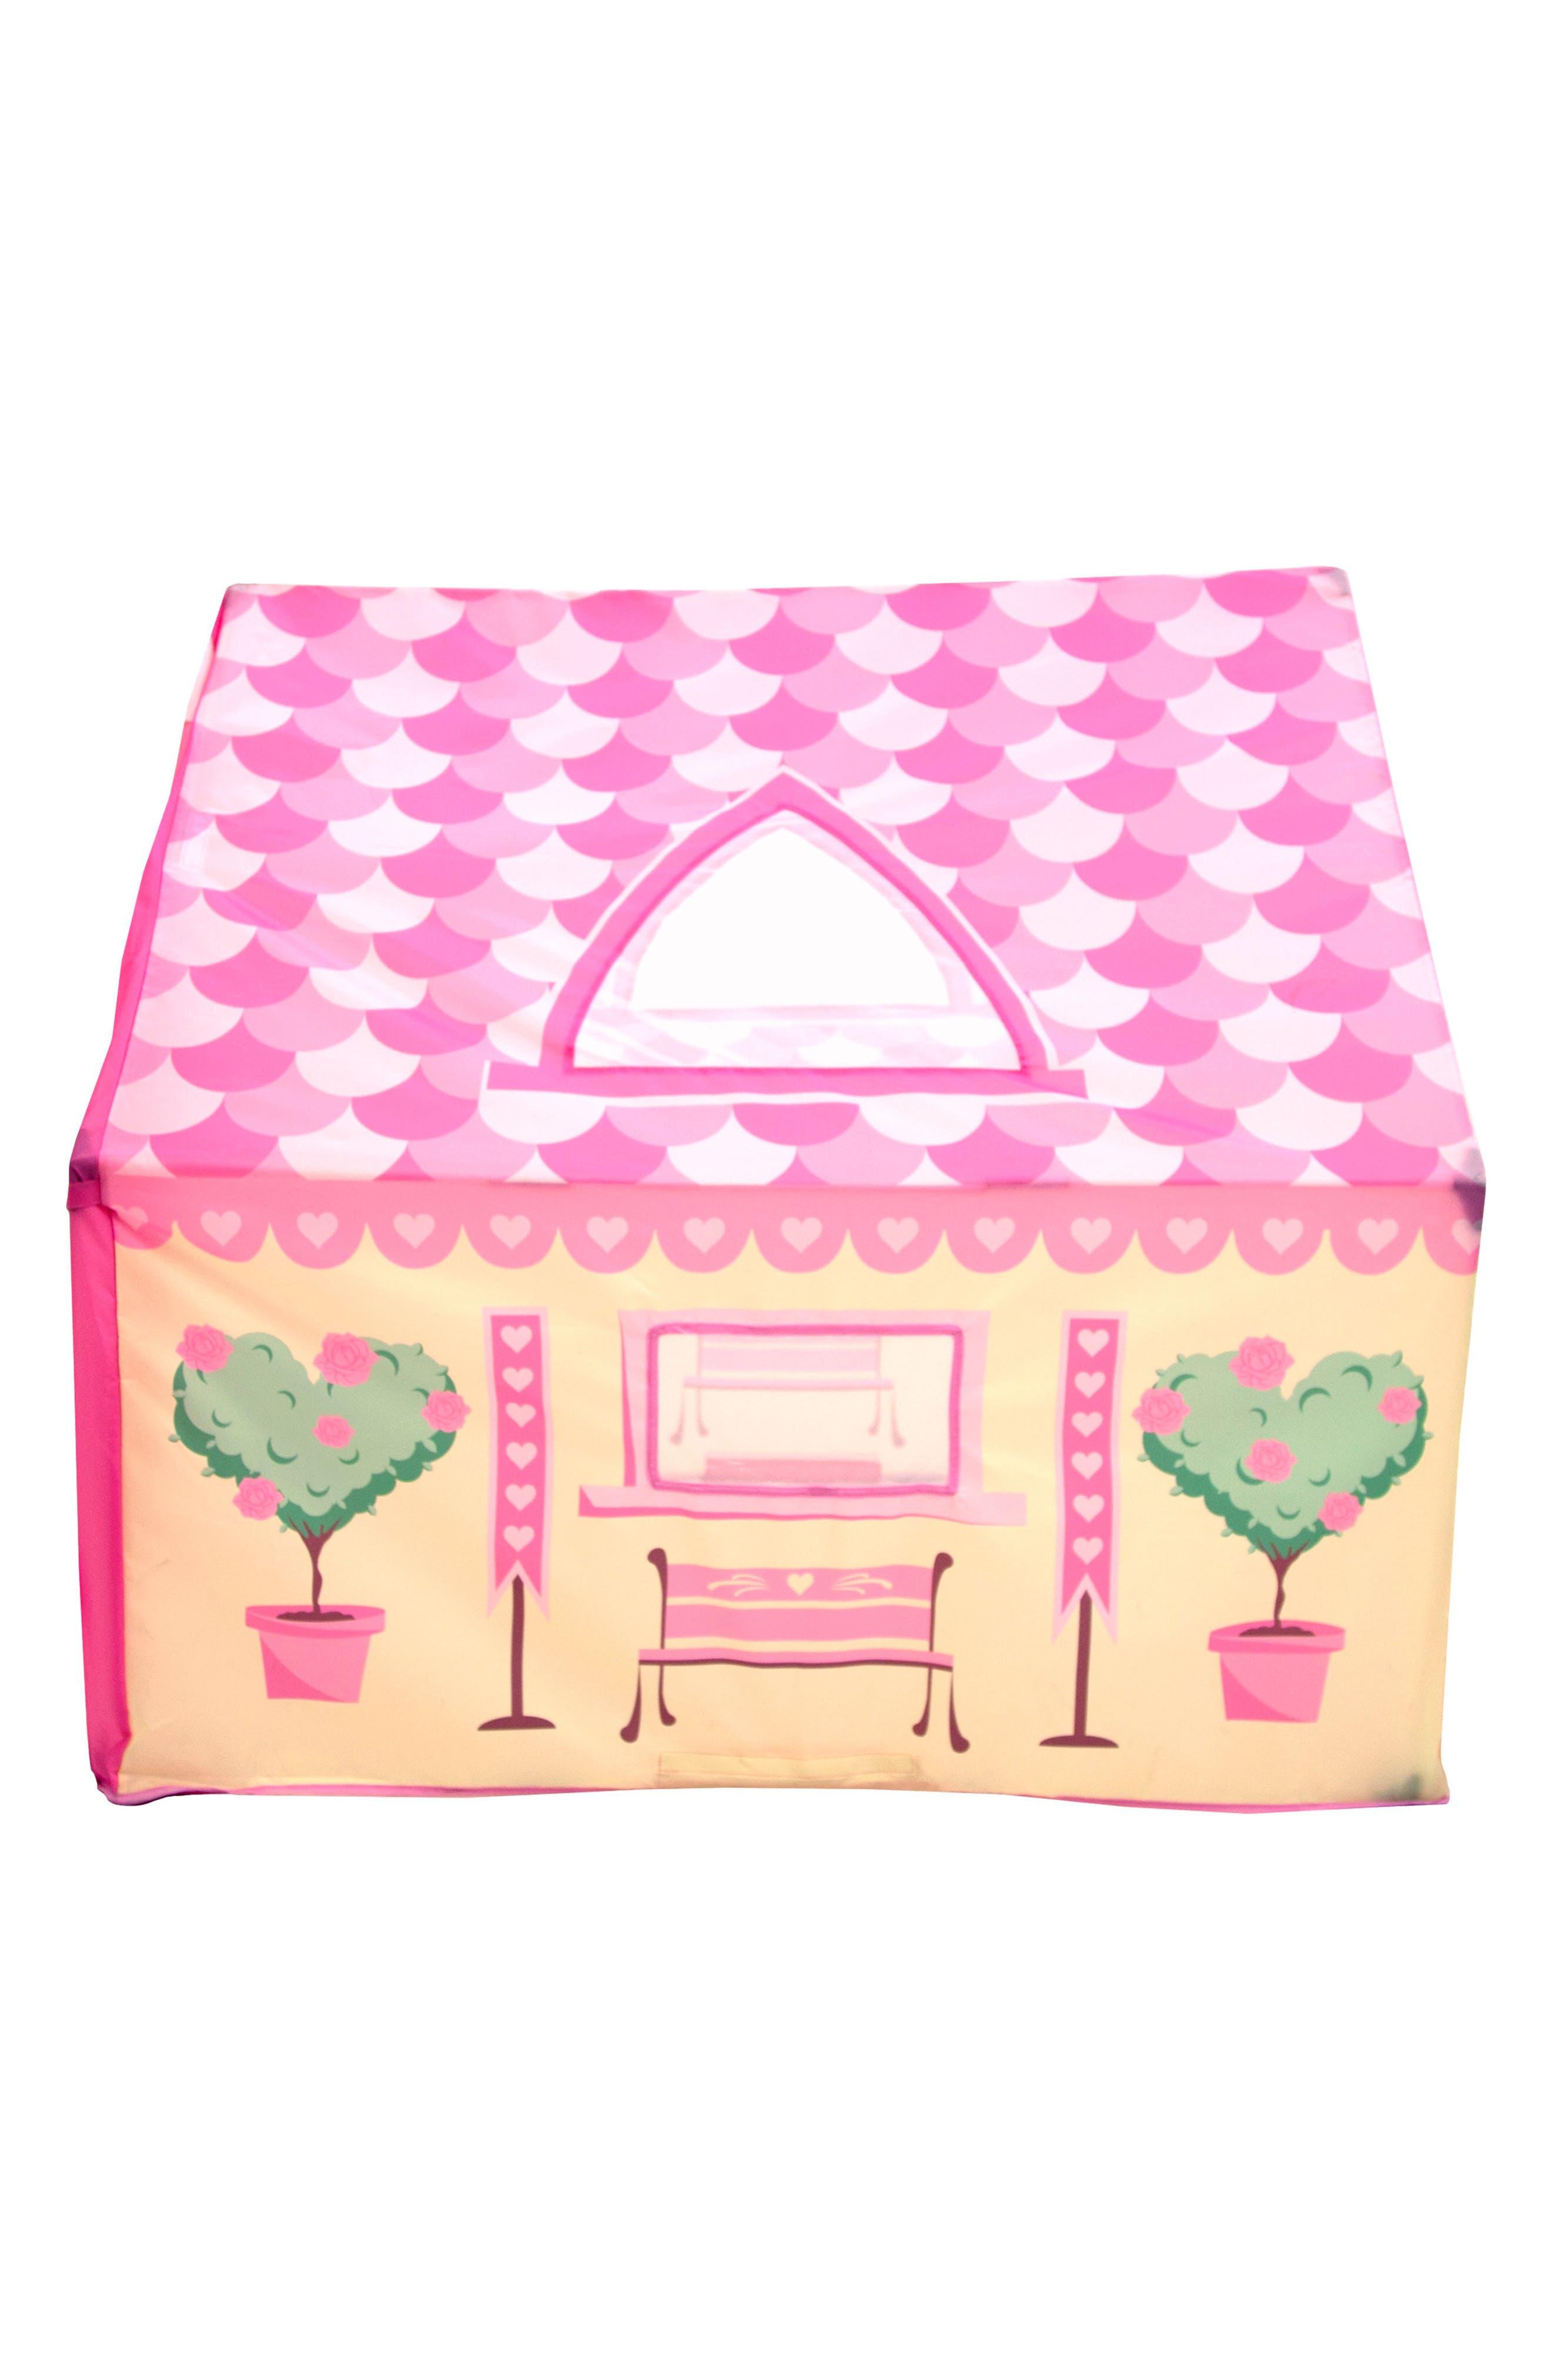 Tea Party Garden Playhouse Tent,                             Alternate thumbnail 5, color,                             PINK